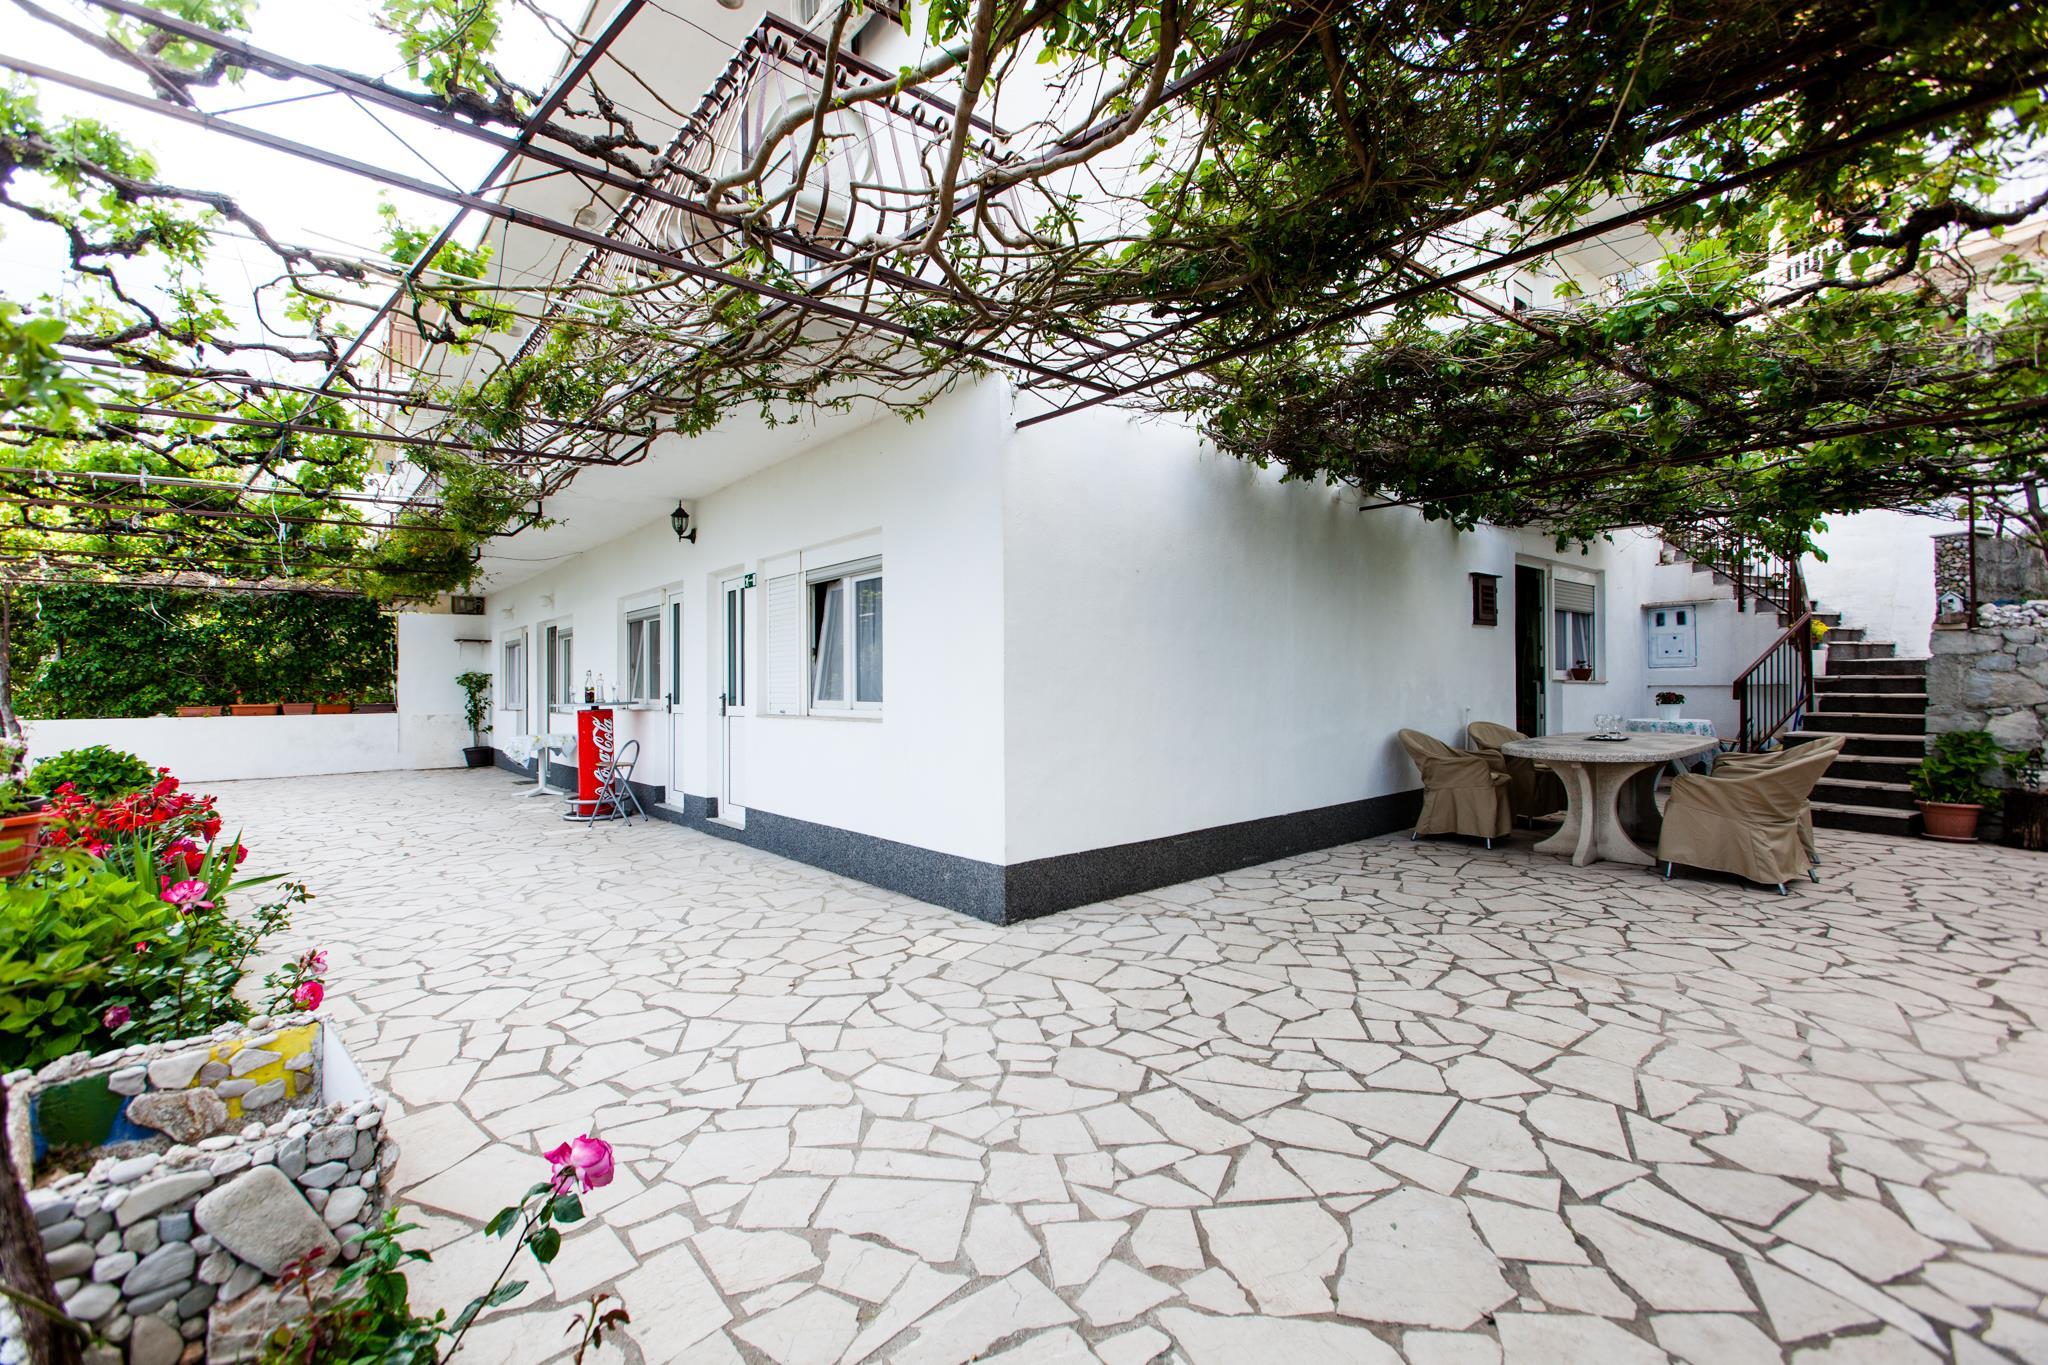 Ferienwohnung Apartments Bla~enka / A3 / One Bedroom (1928327), Lokva Rogoznica, , Dalmatien, Kroatien, Bild 14